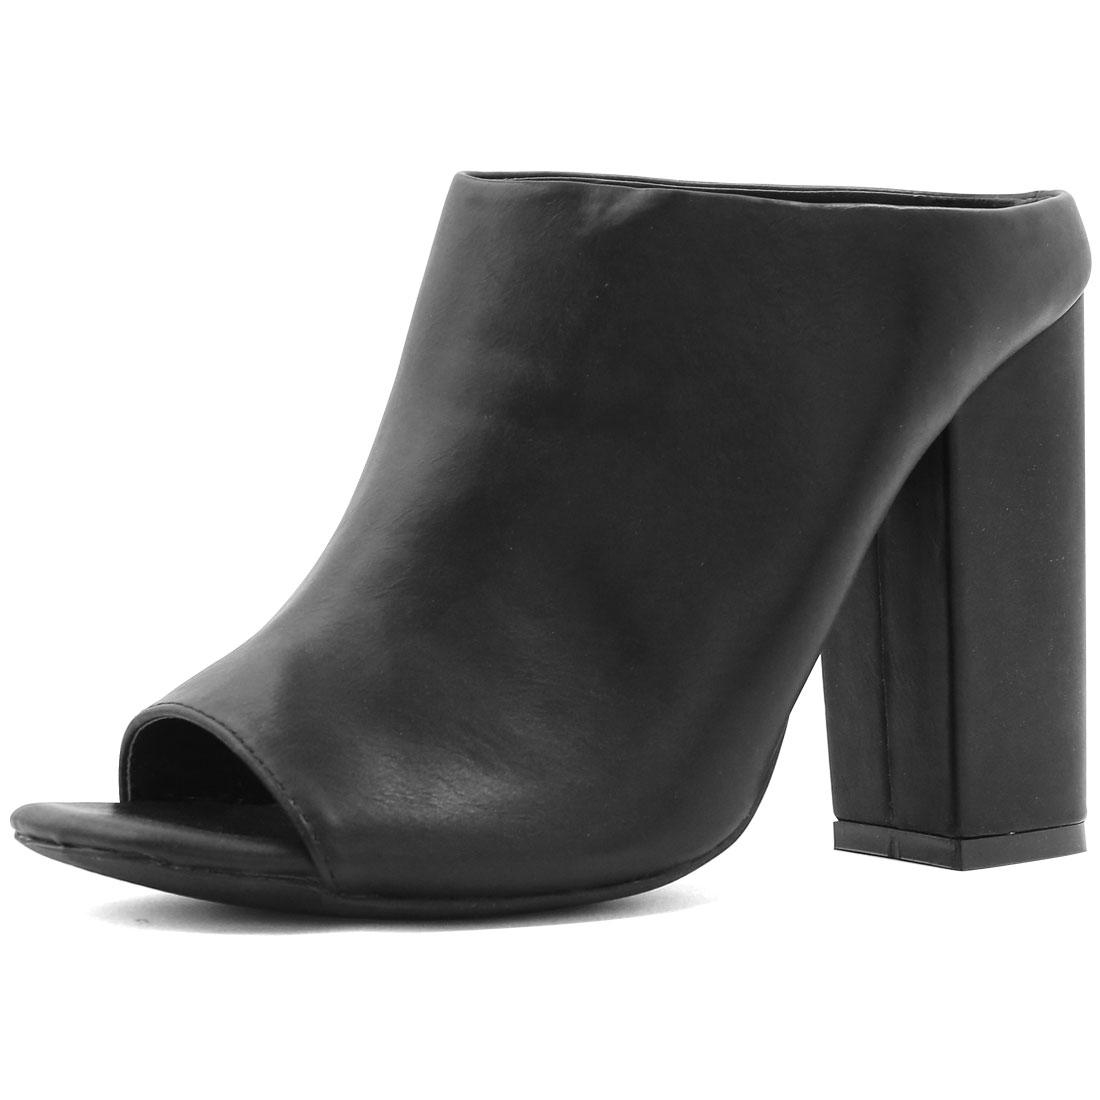 Woman Square Peep Toe Slip On Chunky High Heel Mules Black US 9.5